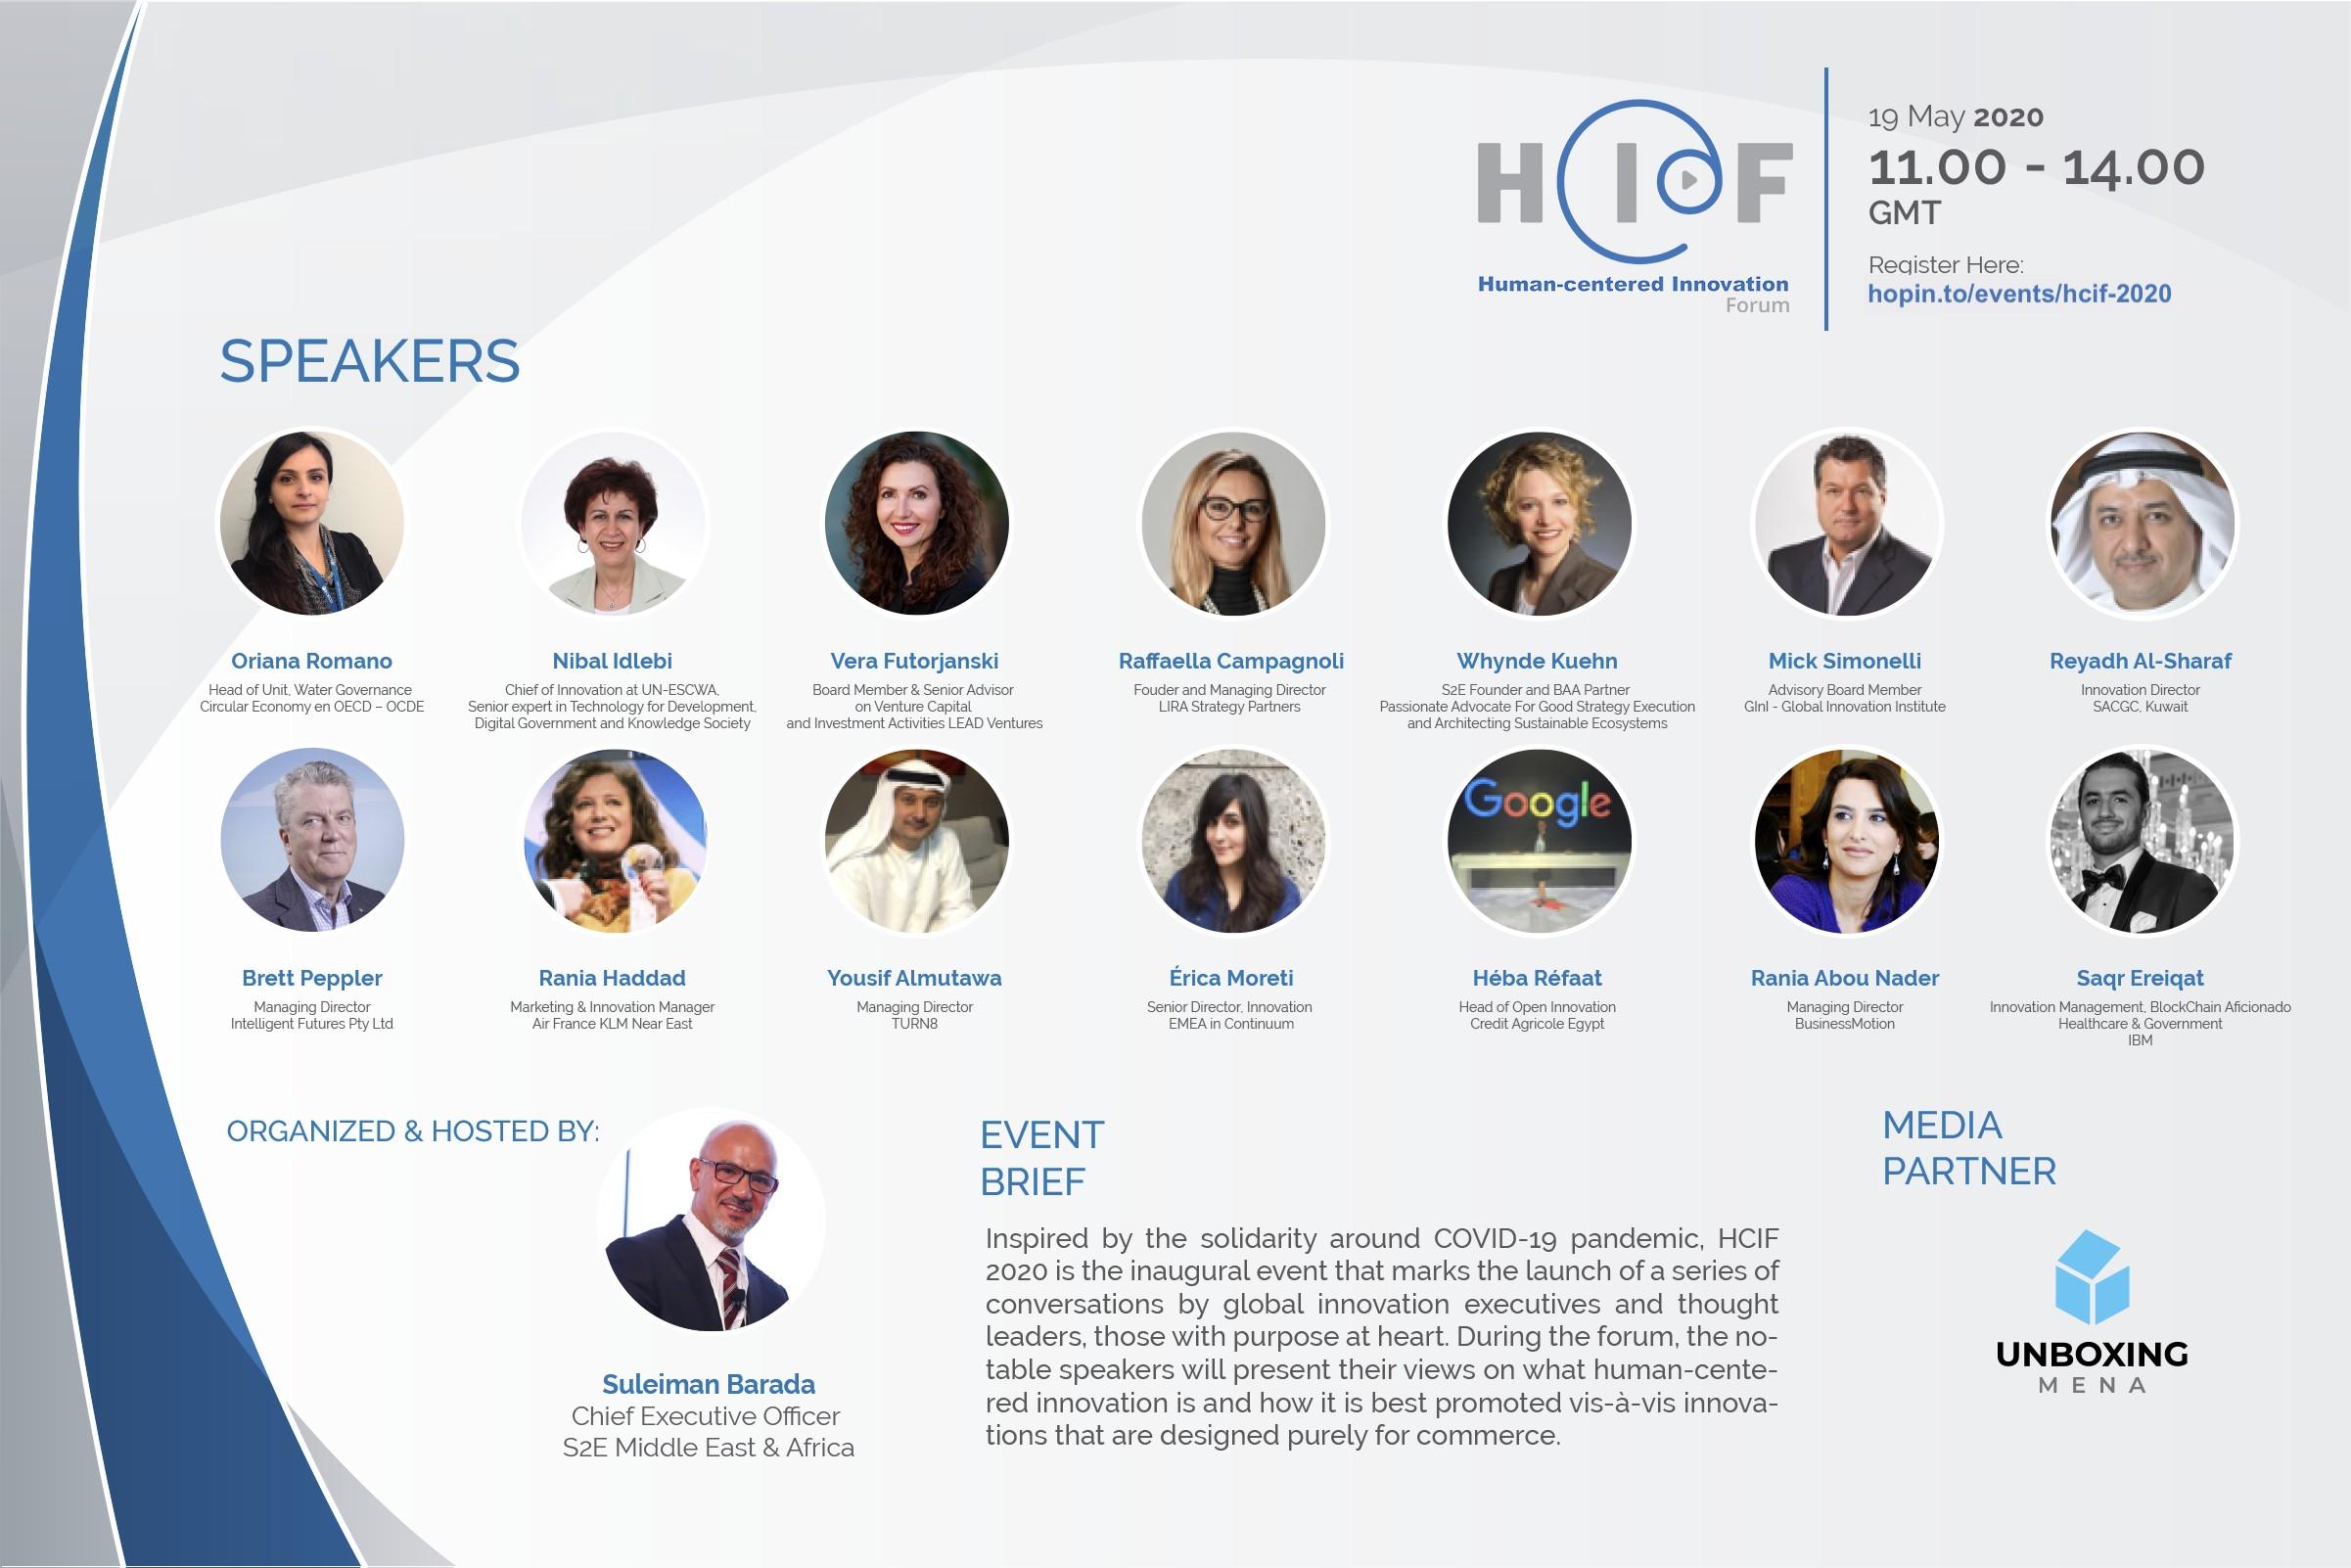 Human-centered Innovation Forum 2020